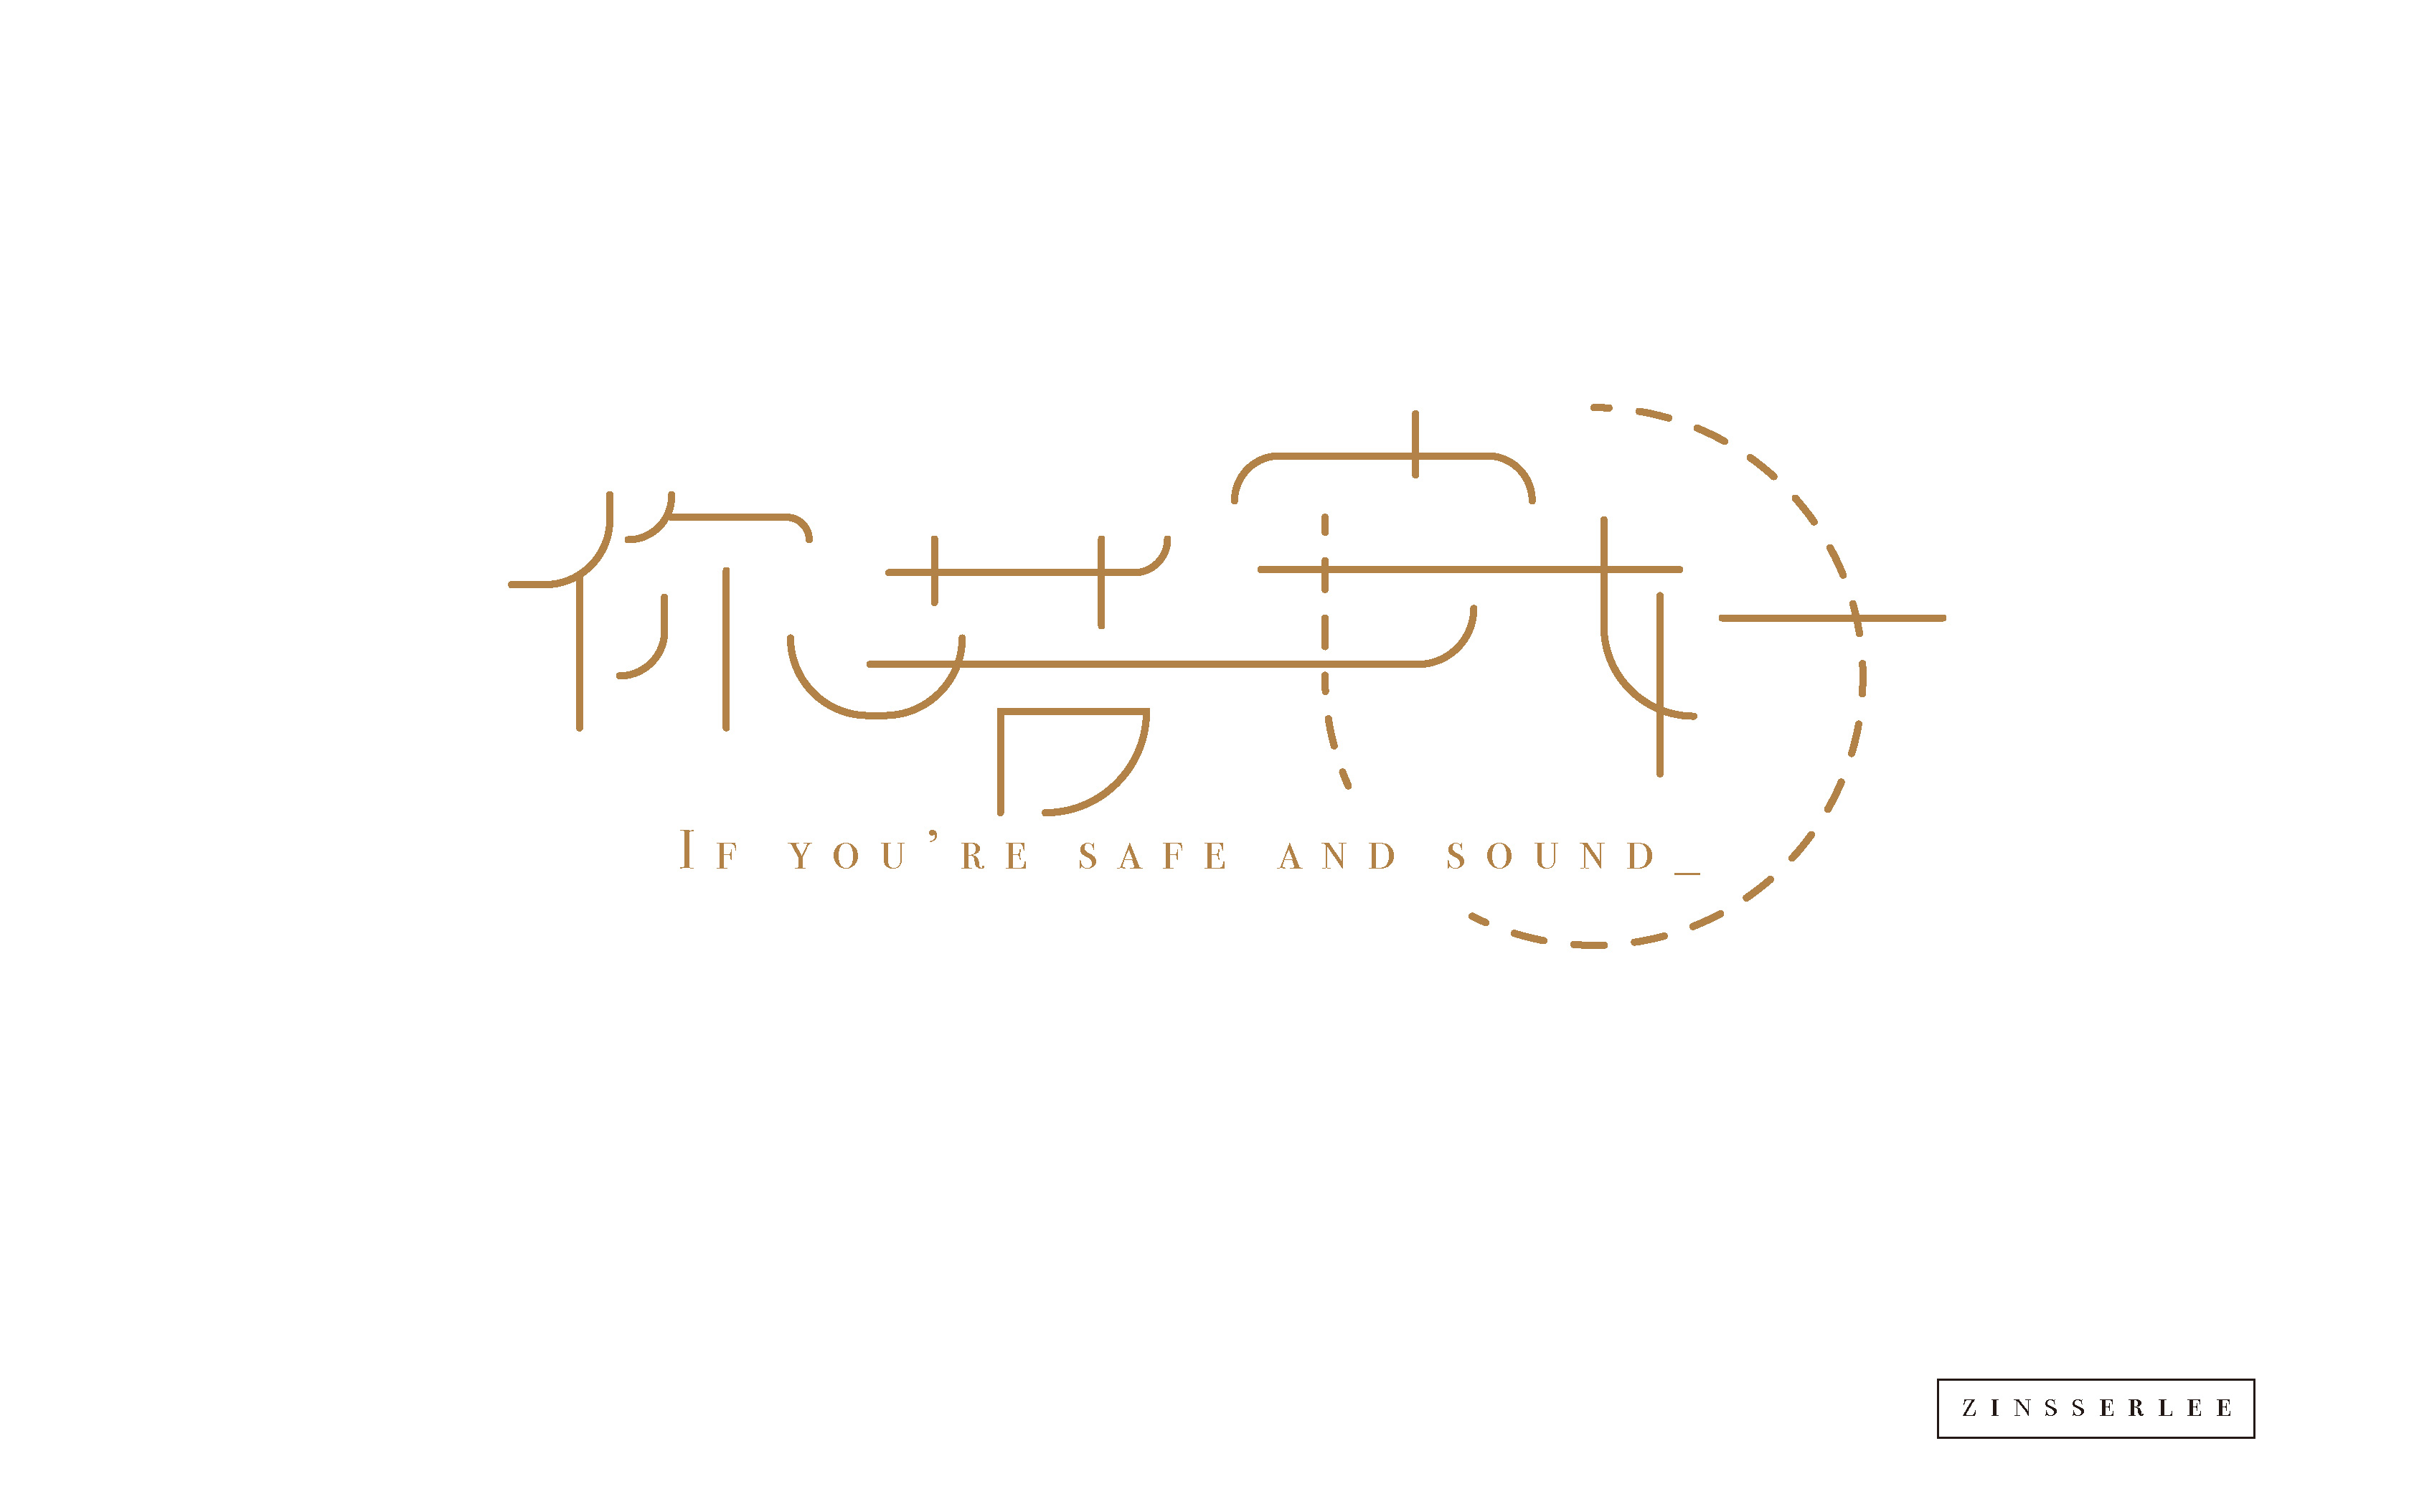 【logo设计】文字商标设计图片